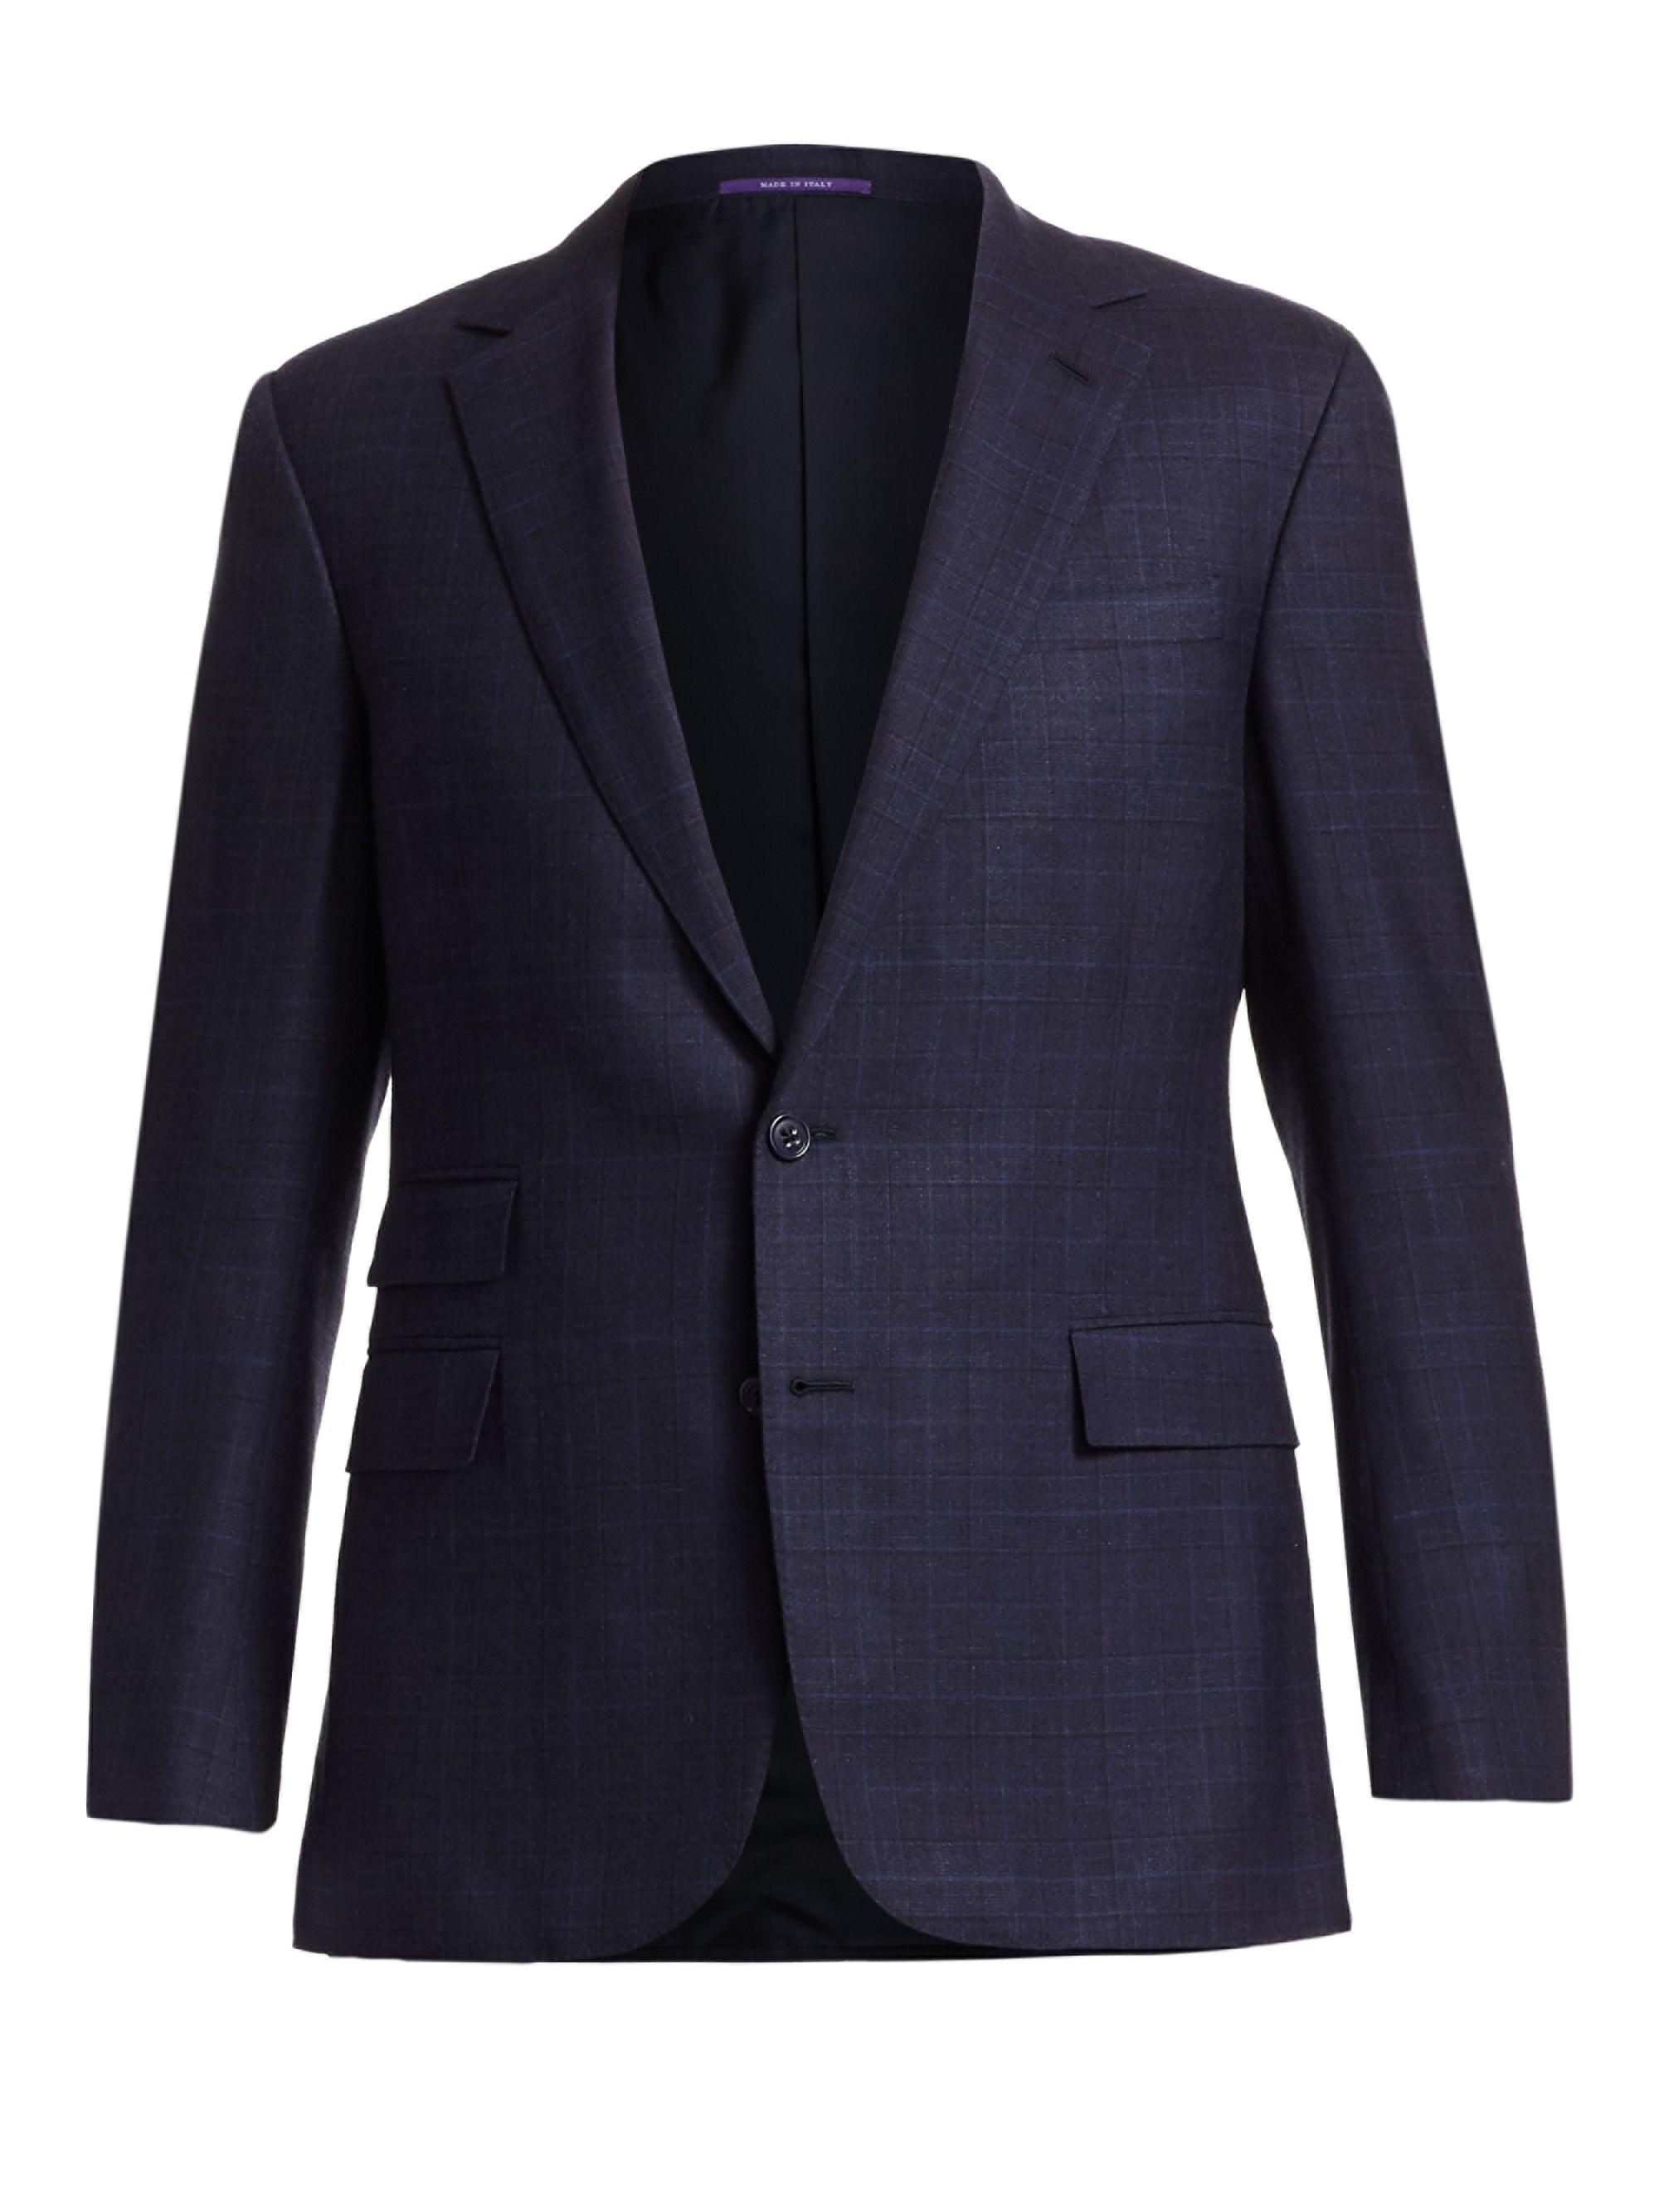 d9864b2fda11 Lyst - Ralph Lauren Purple Label Douglas Two-button Jacquard Wool ...